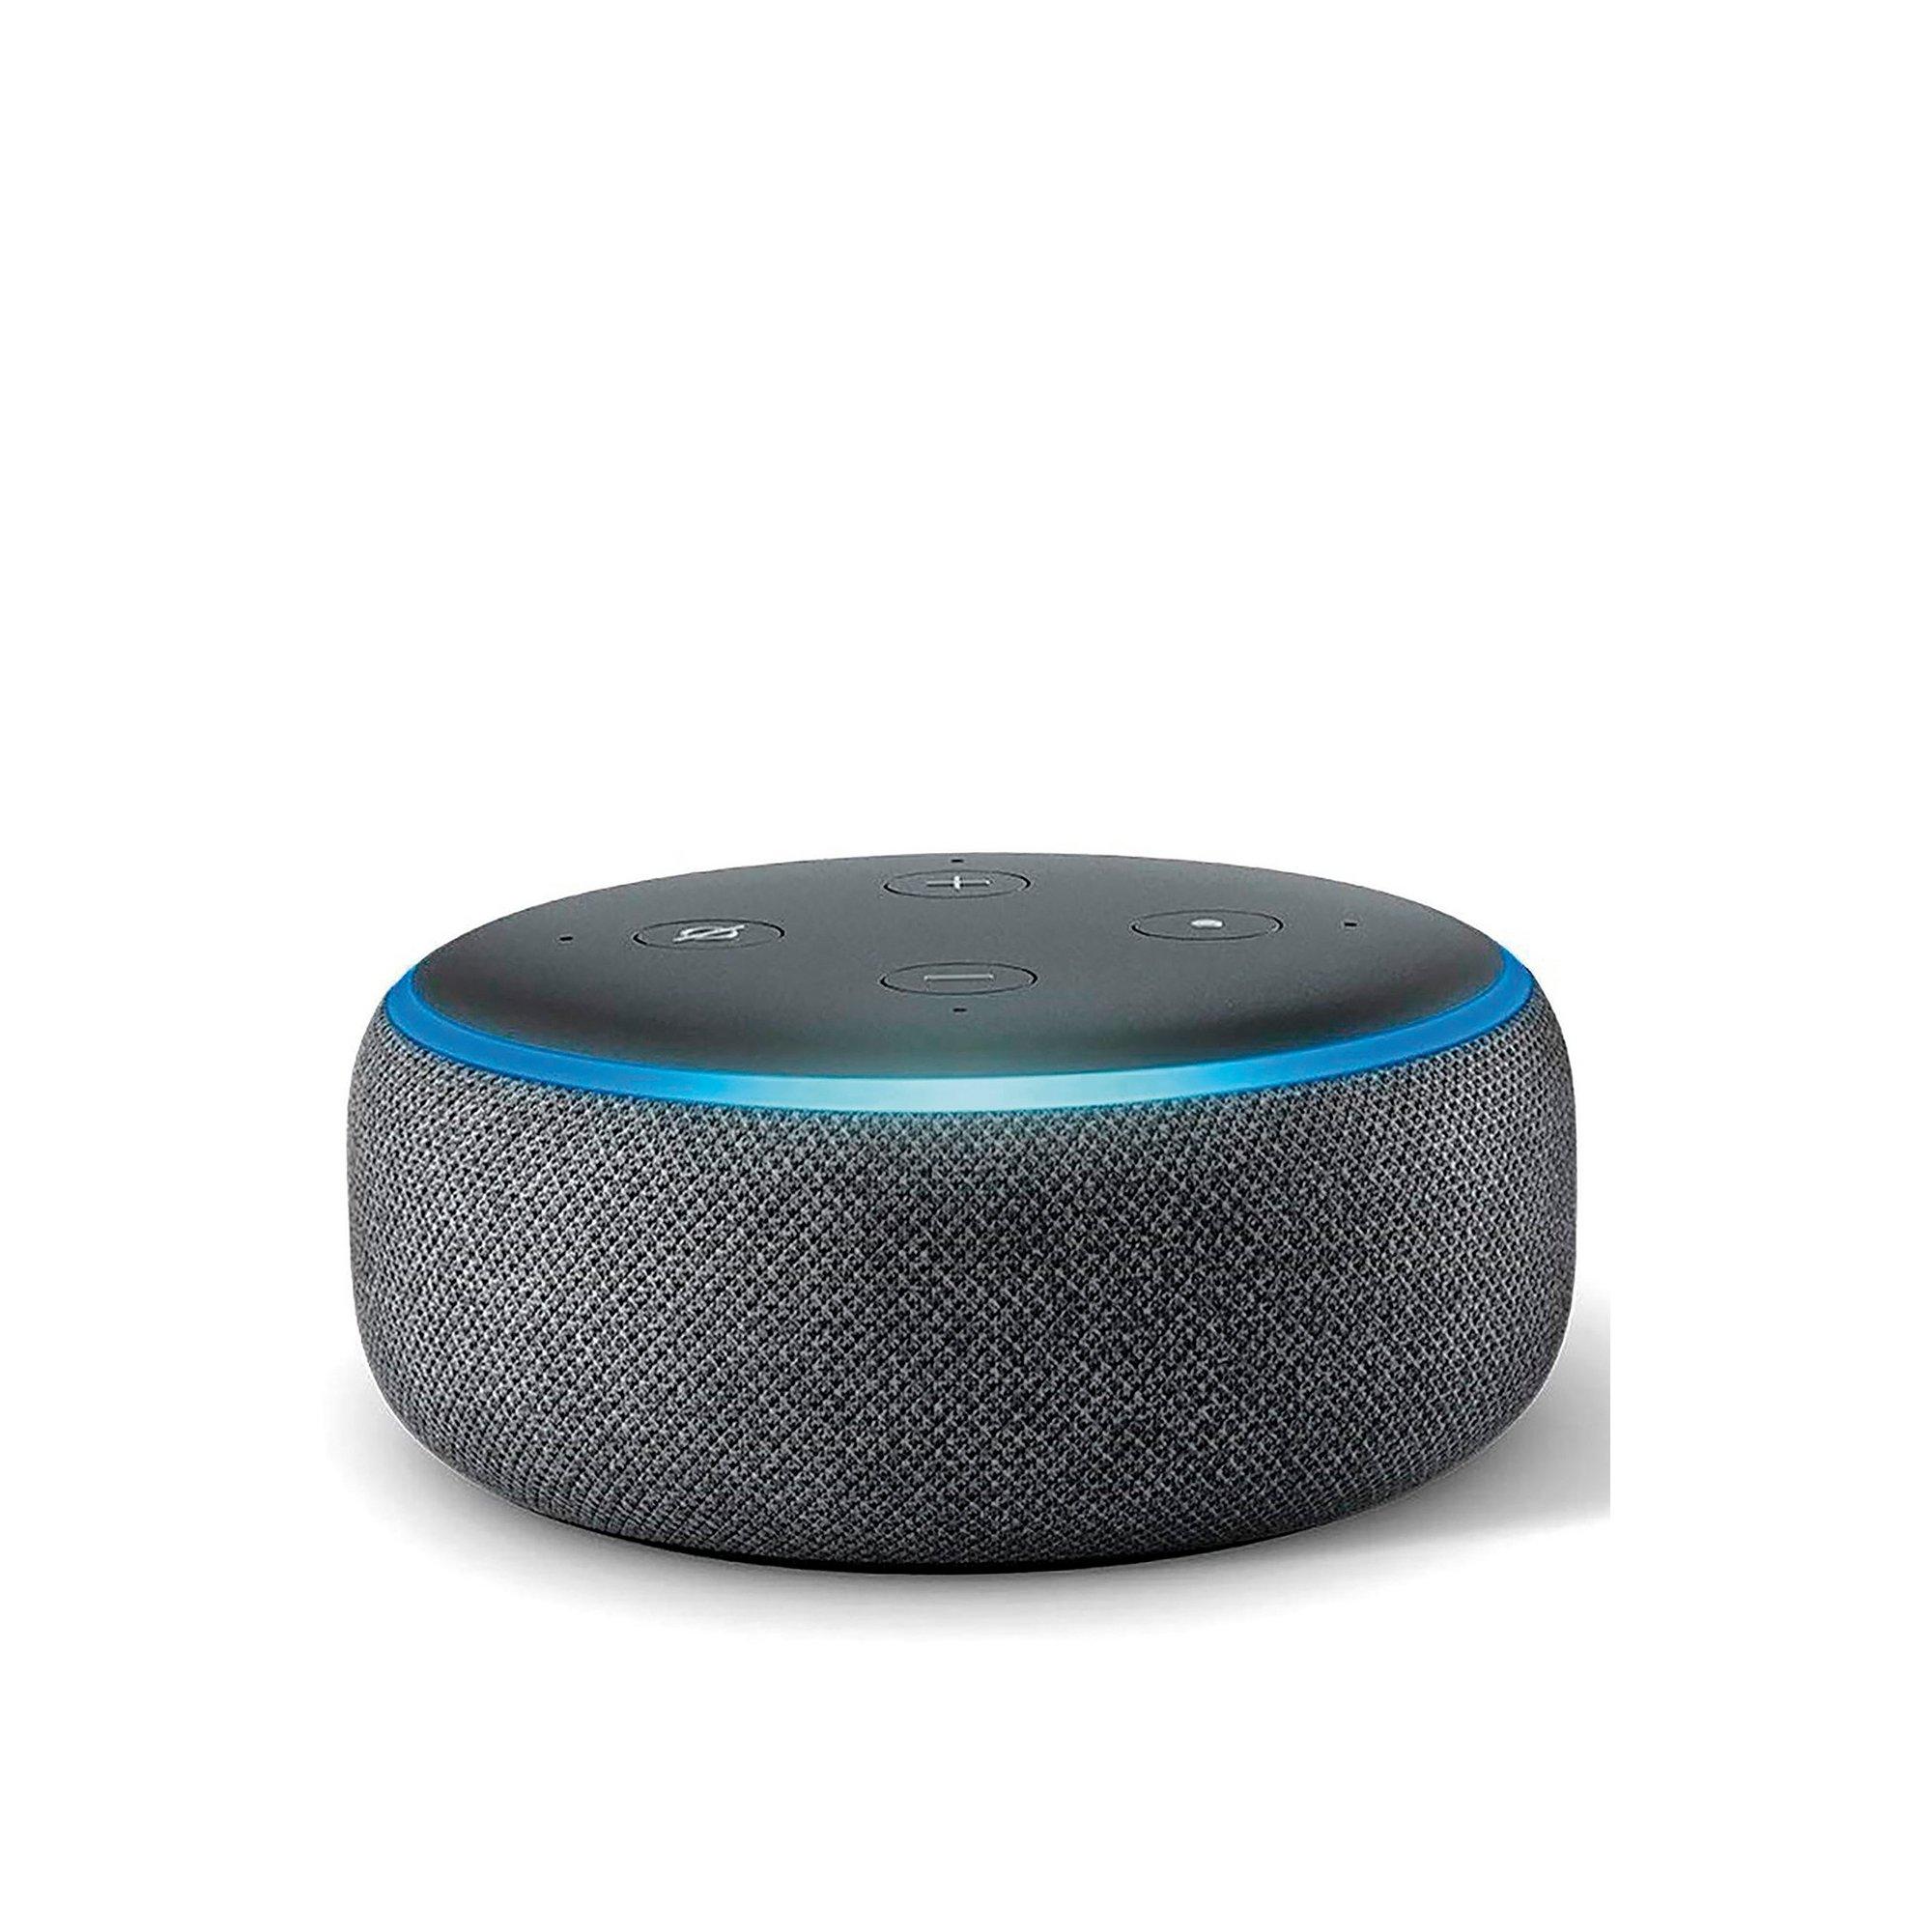 Image of Amazon Echo Dot (3rd Gen)